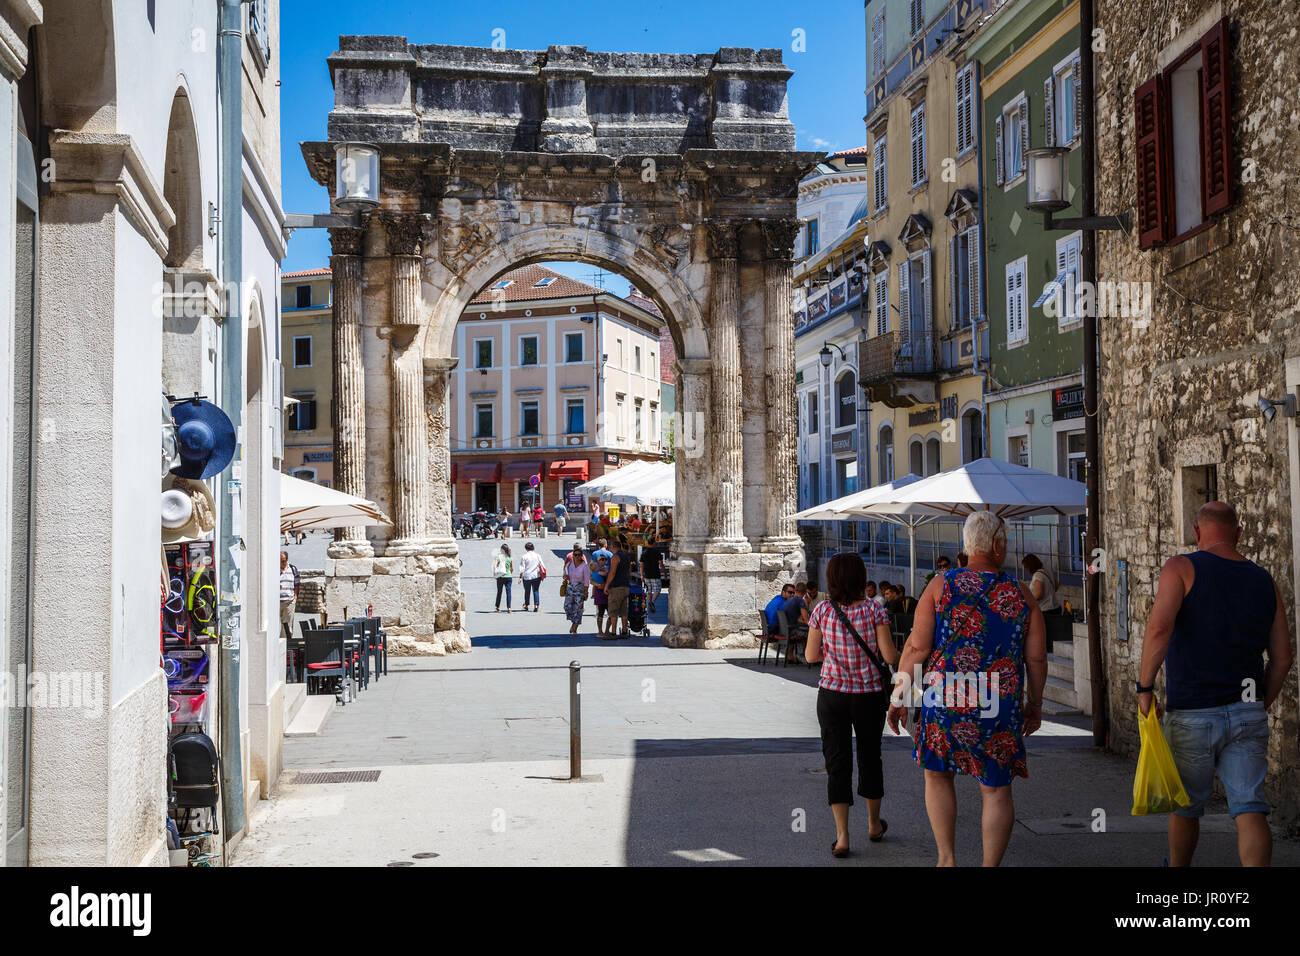 Pula, Croatia city center - Stock Image